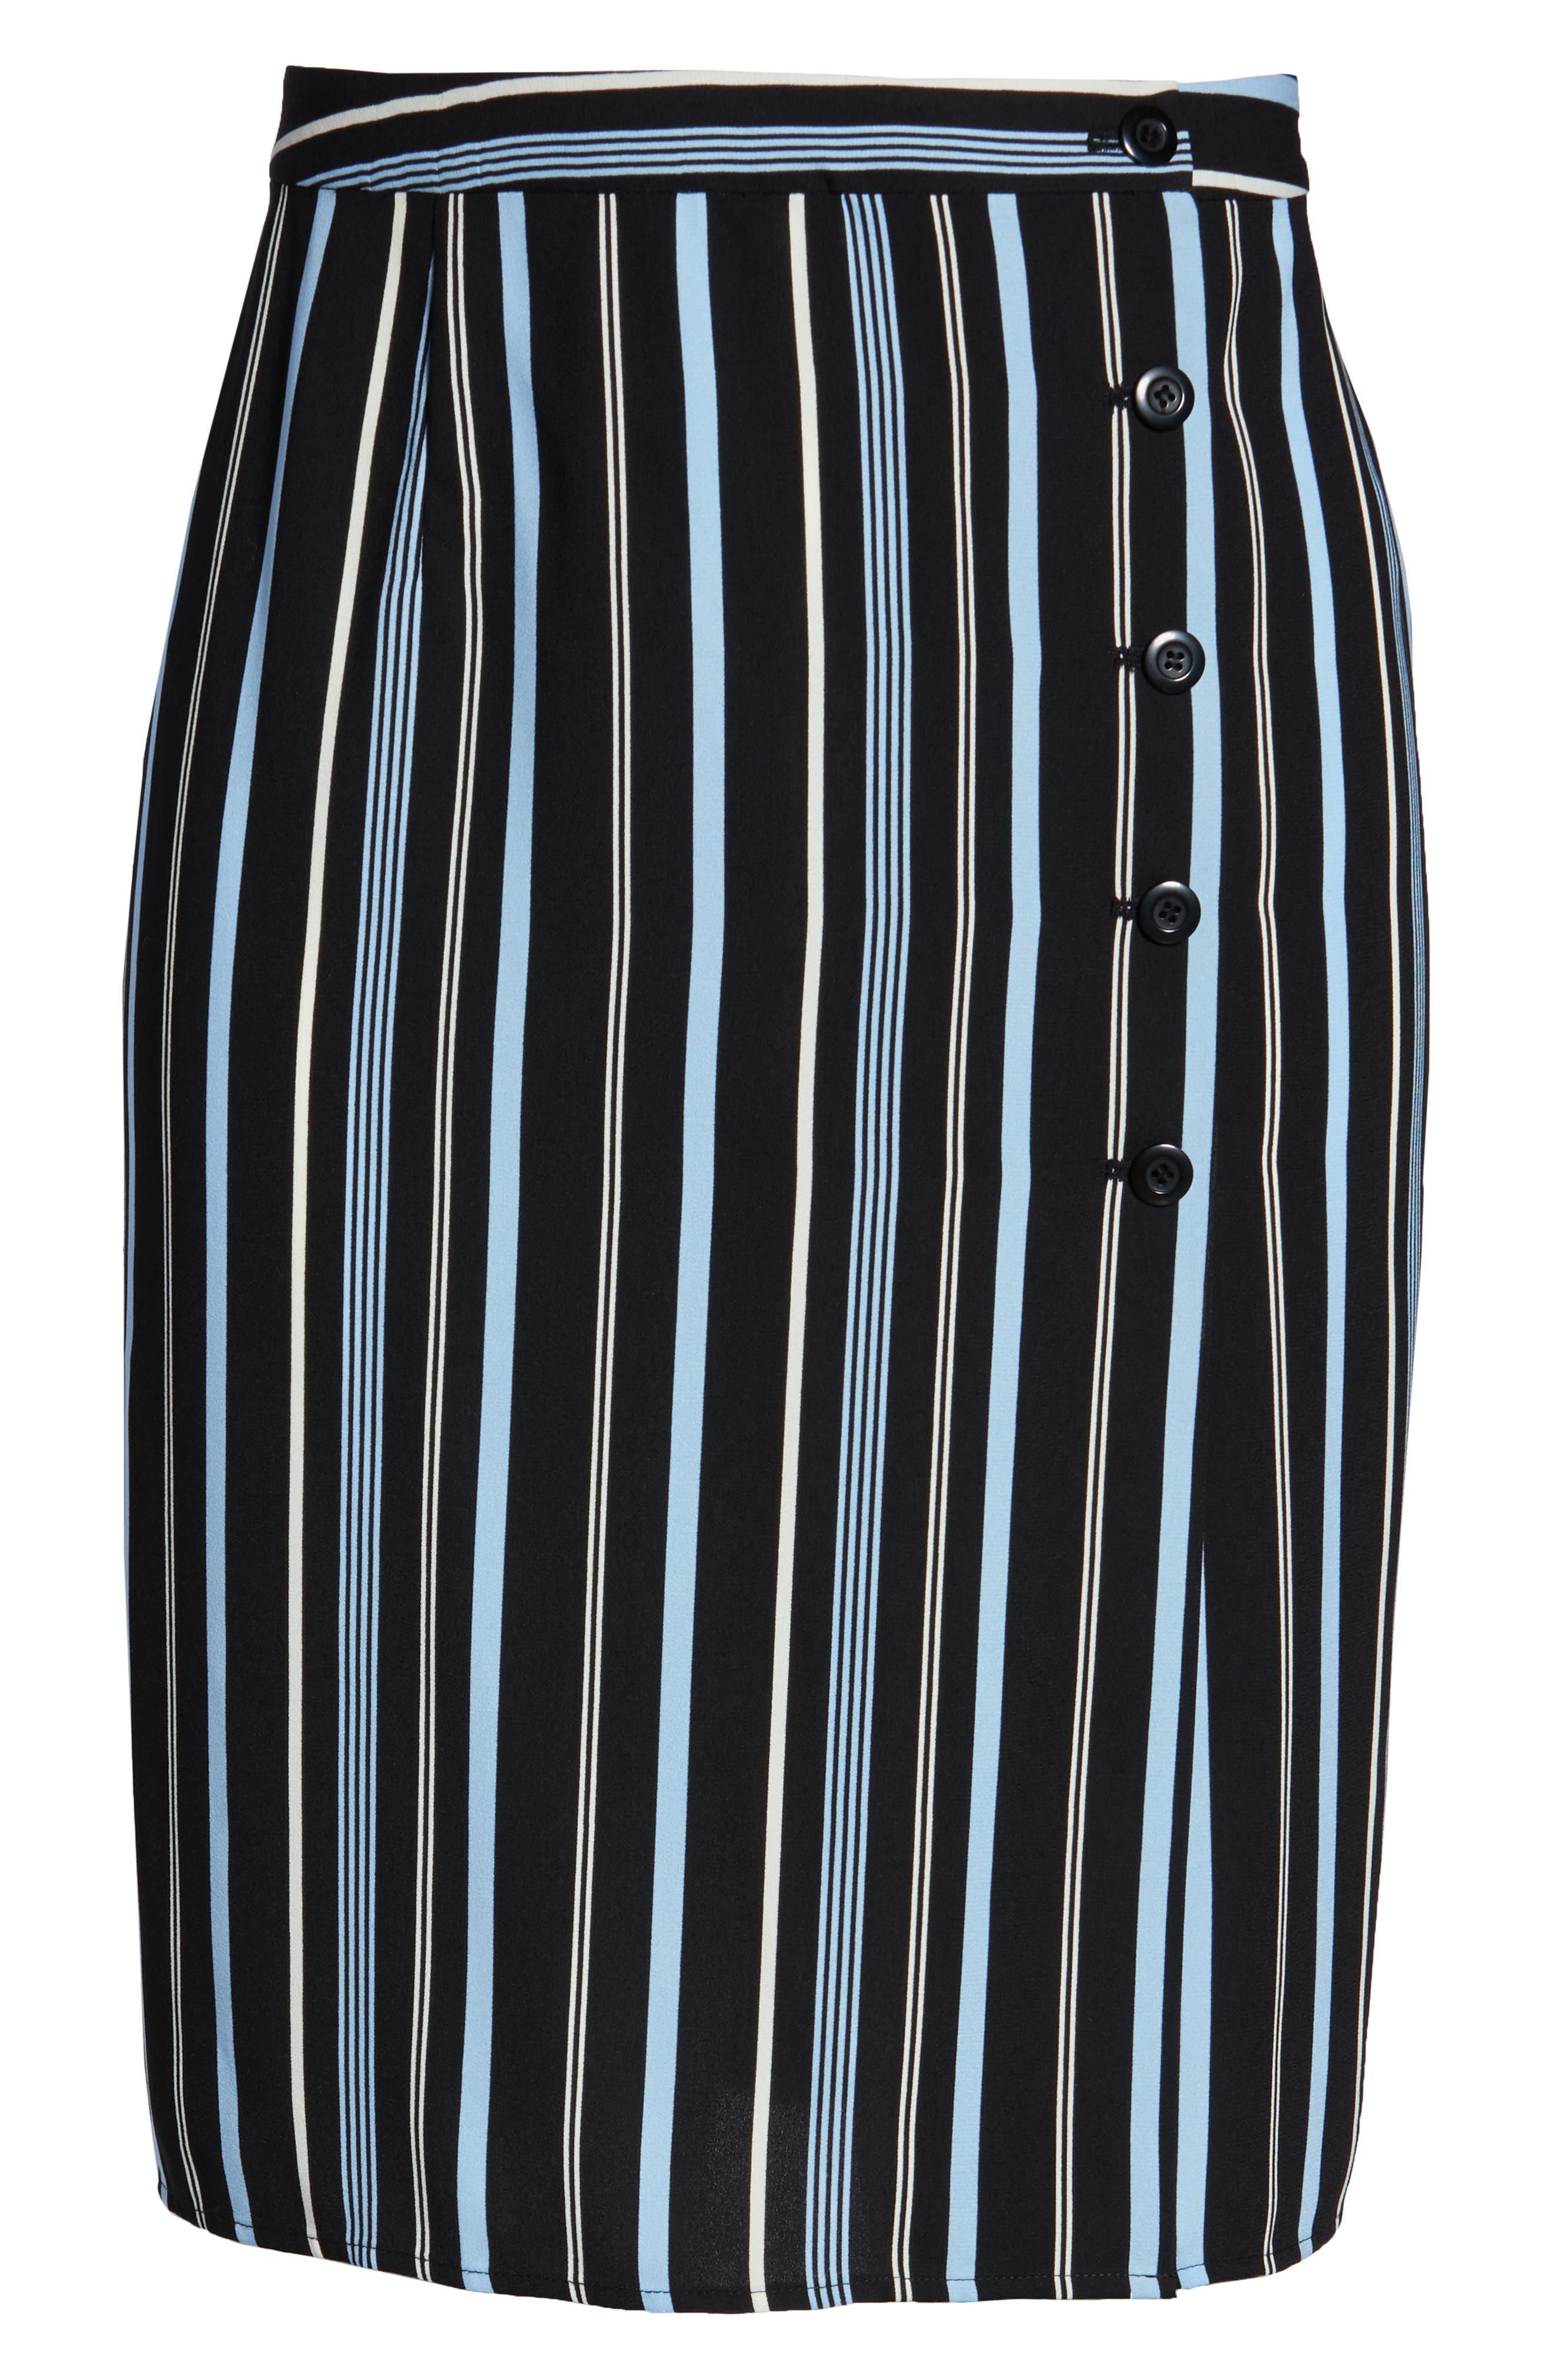 Button Wrap Skirt,                             Alternate thumbnail 12, color,                             BLACK MULTI COLORED STRIPE